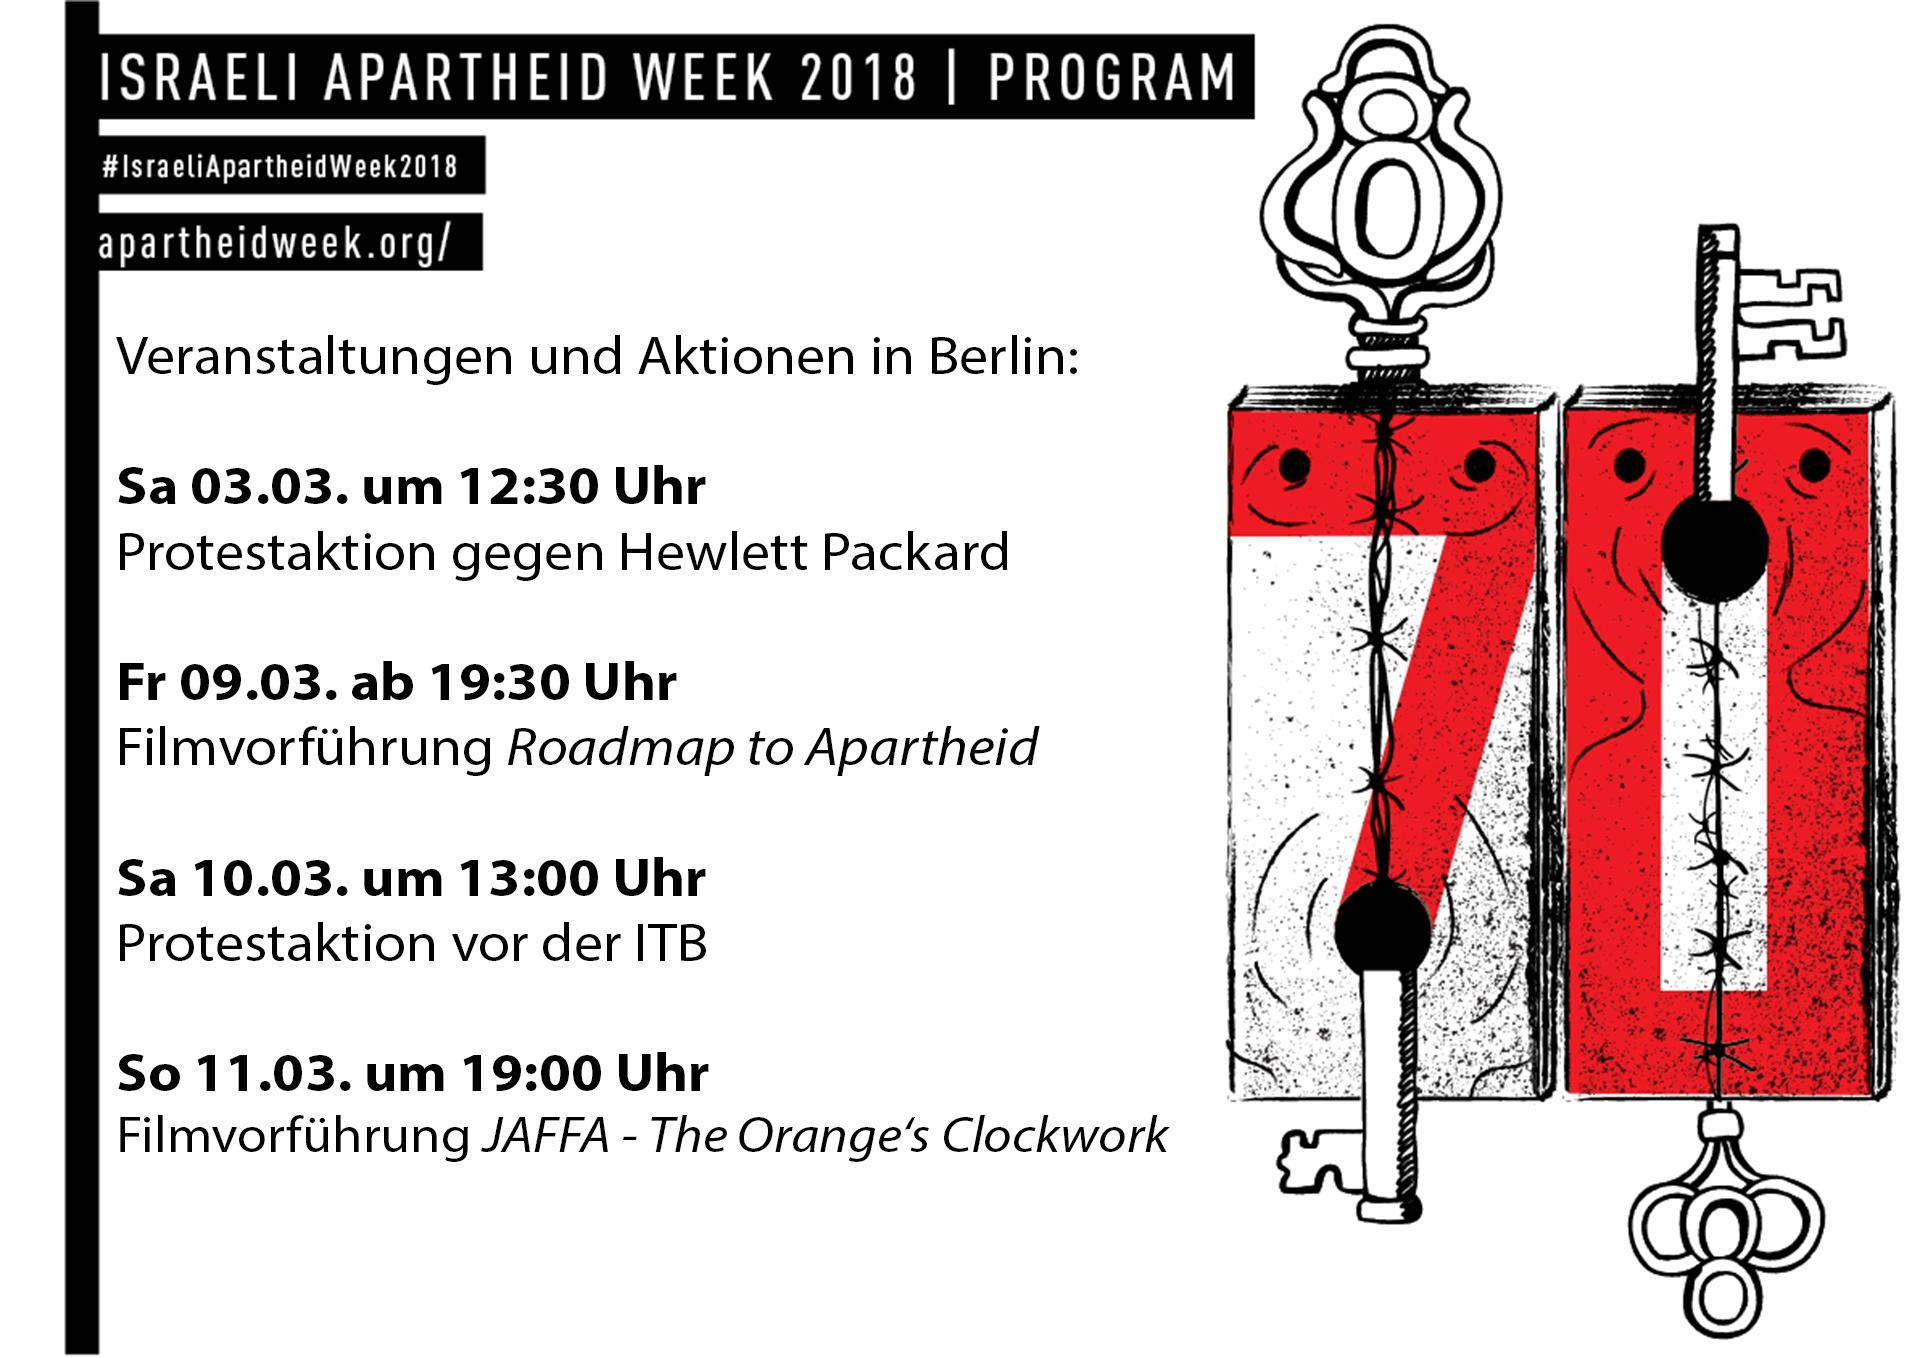 aktionen im rahmen der 39 israeli apartheid 39 week in berlin bds kampagne. Black Bedroom Furniture Sets. Home Design Ideas